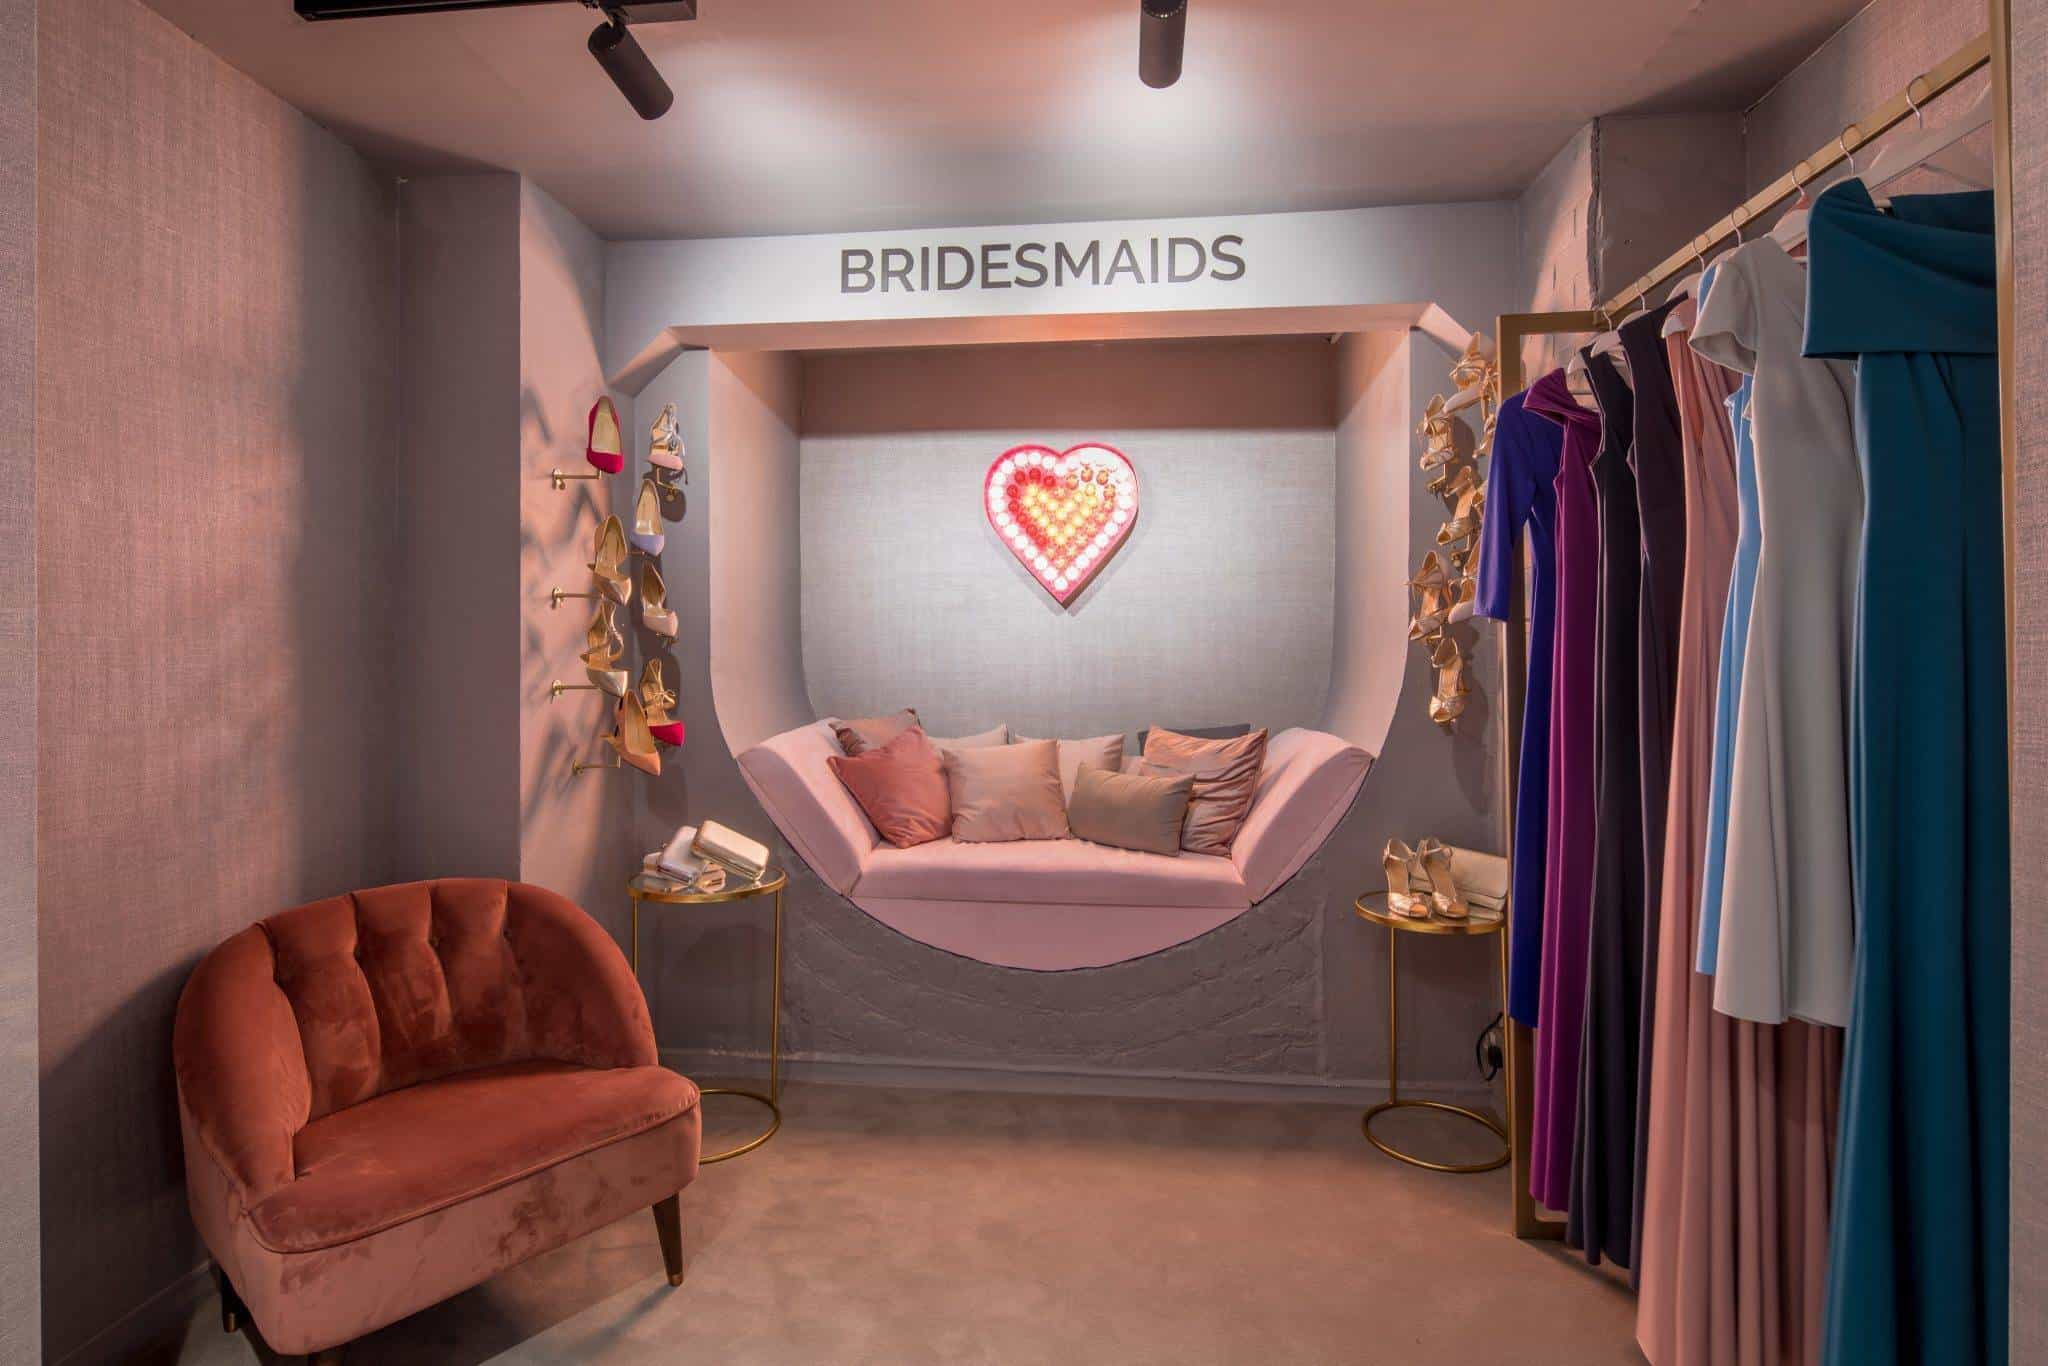 The Wedding Gallery Bridesmaids